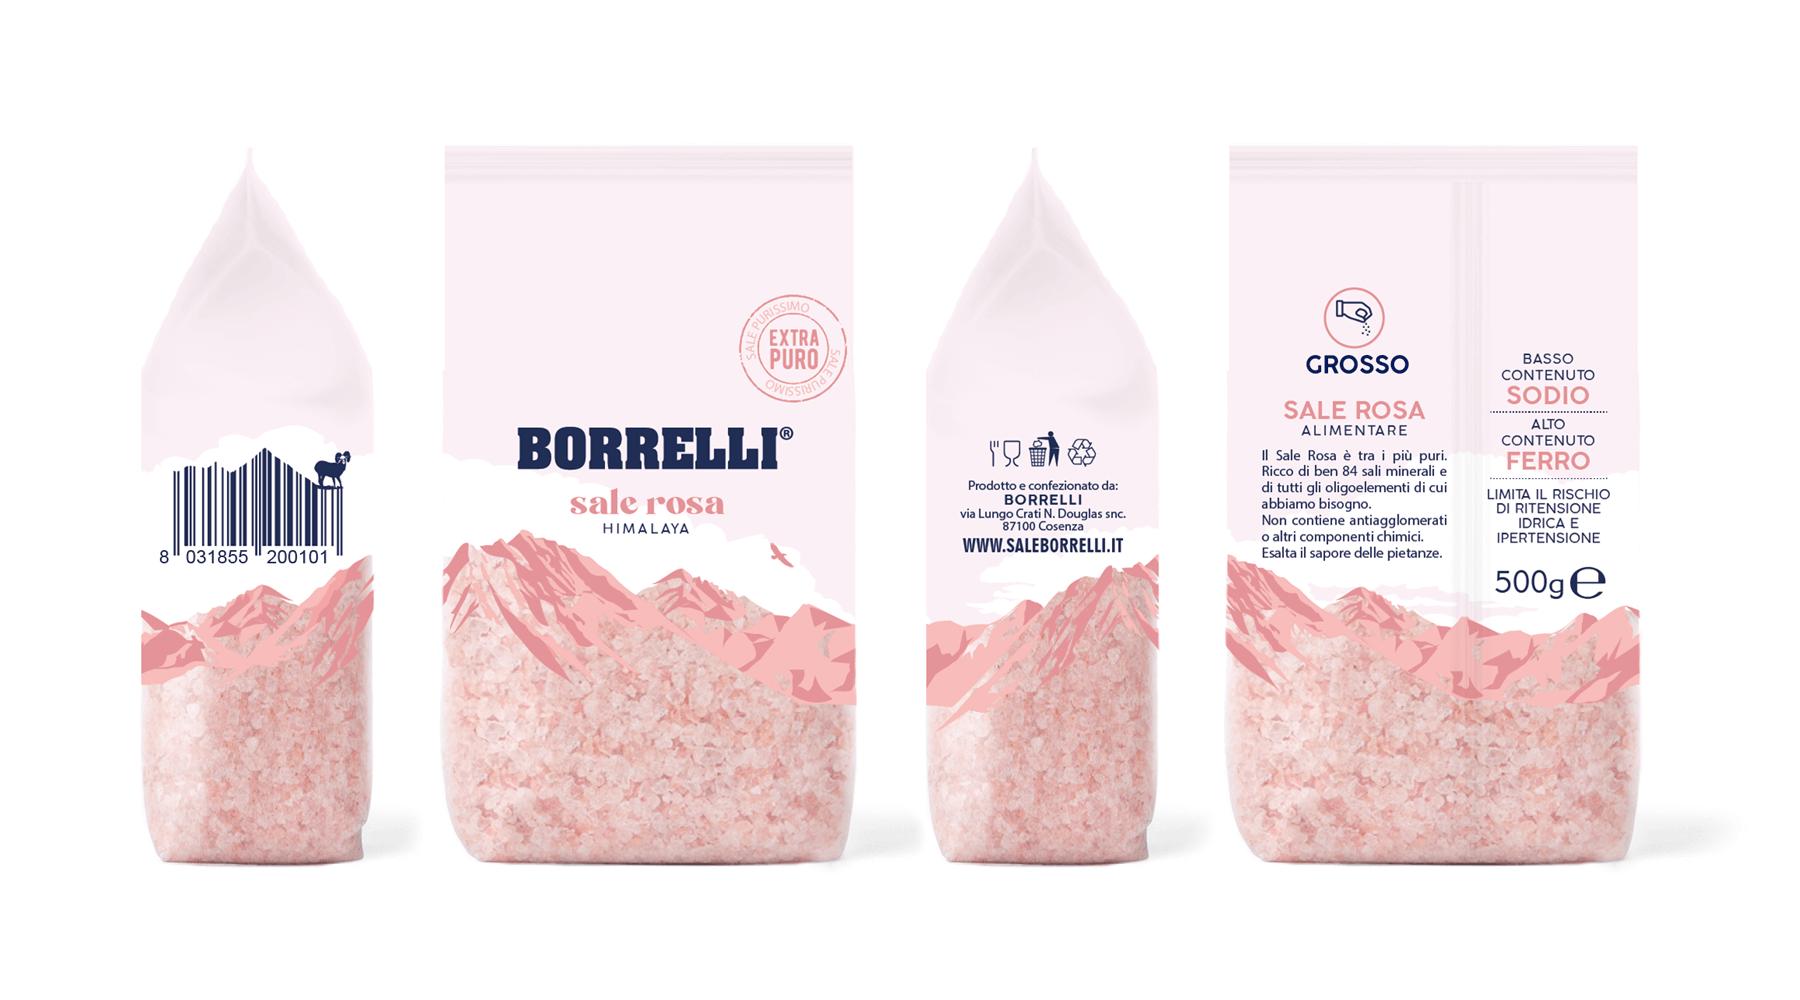 Studio La Regina - sale grosso rosa dell'Himalaya Borrelli